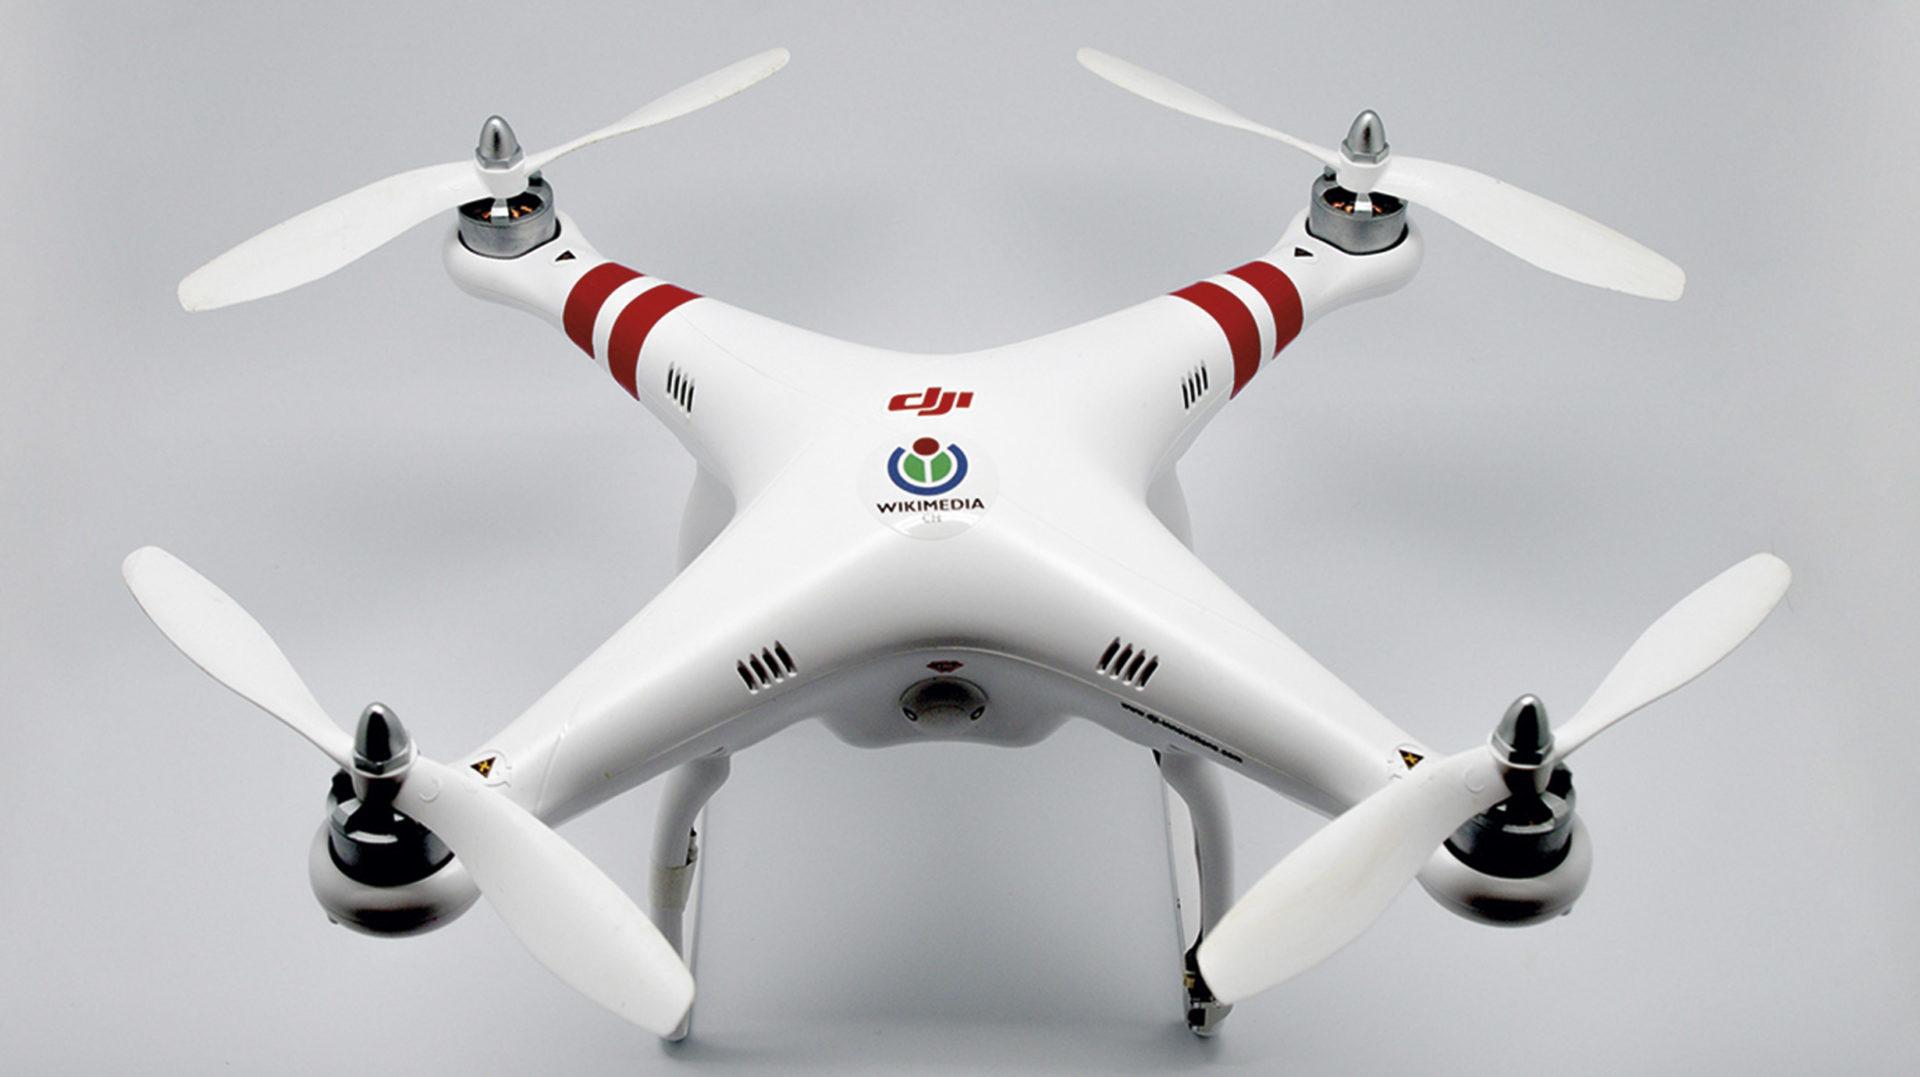 Un dron vist de prop